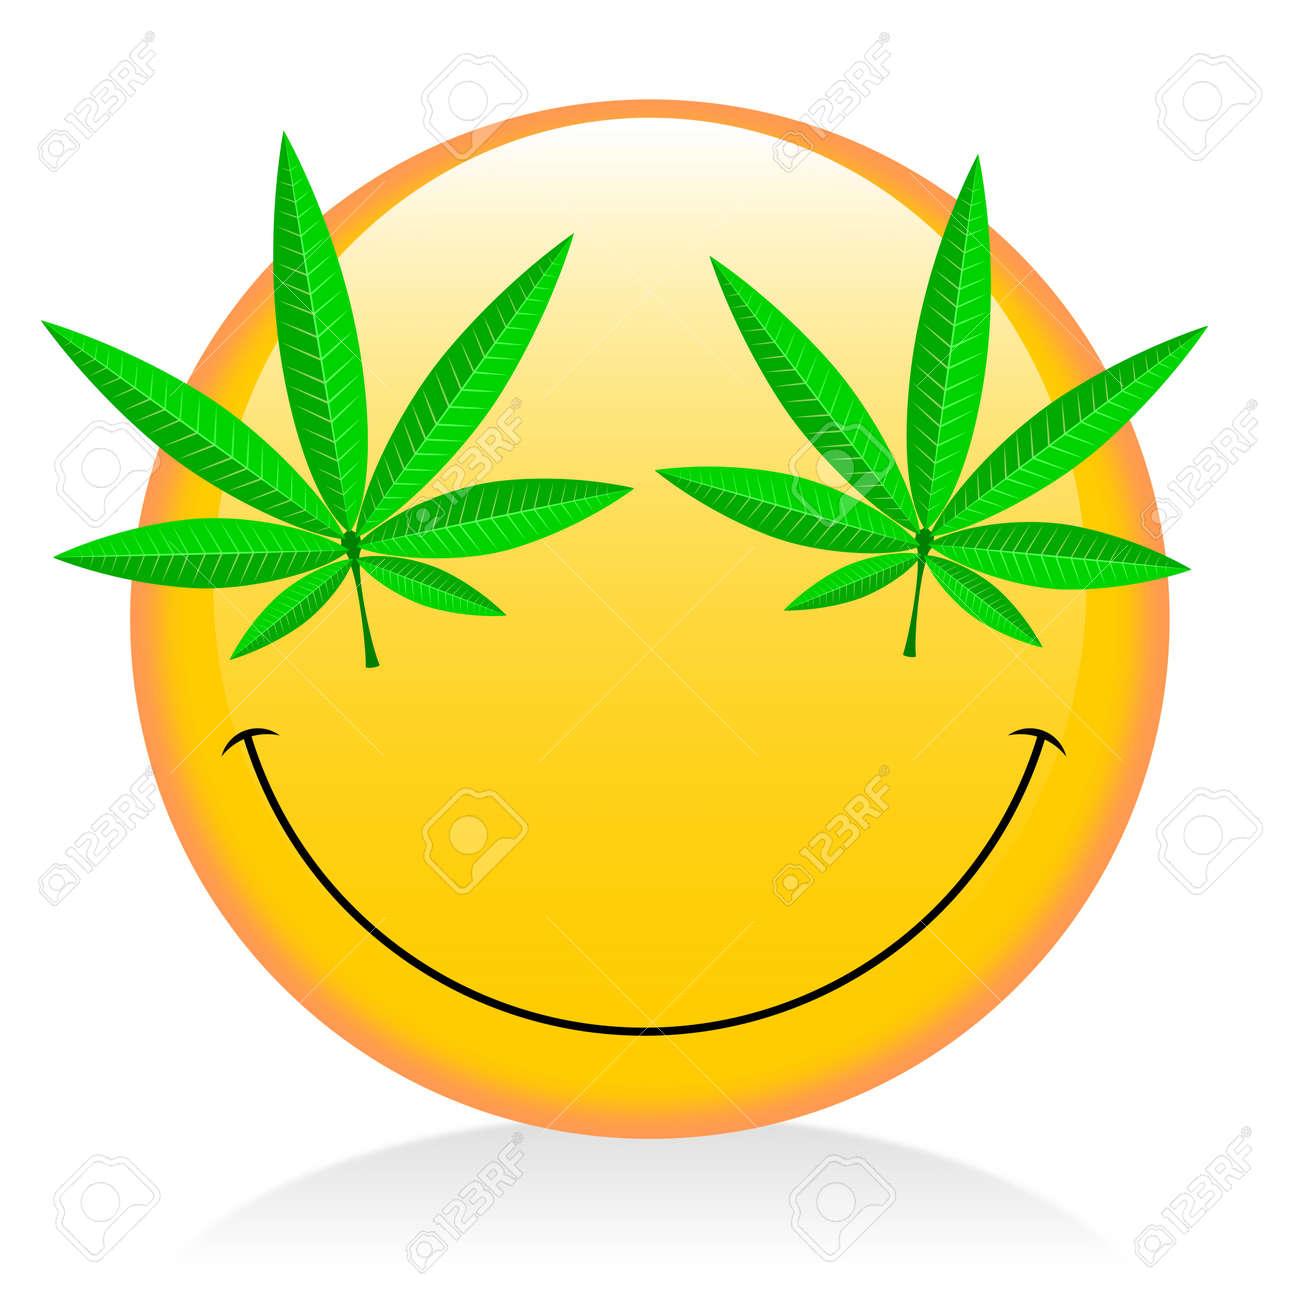 Emoji - Smoking Weed Stock Photo, Picture And Royalty Free Image. Image  83031488.